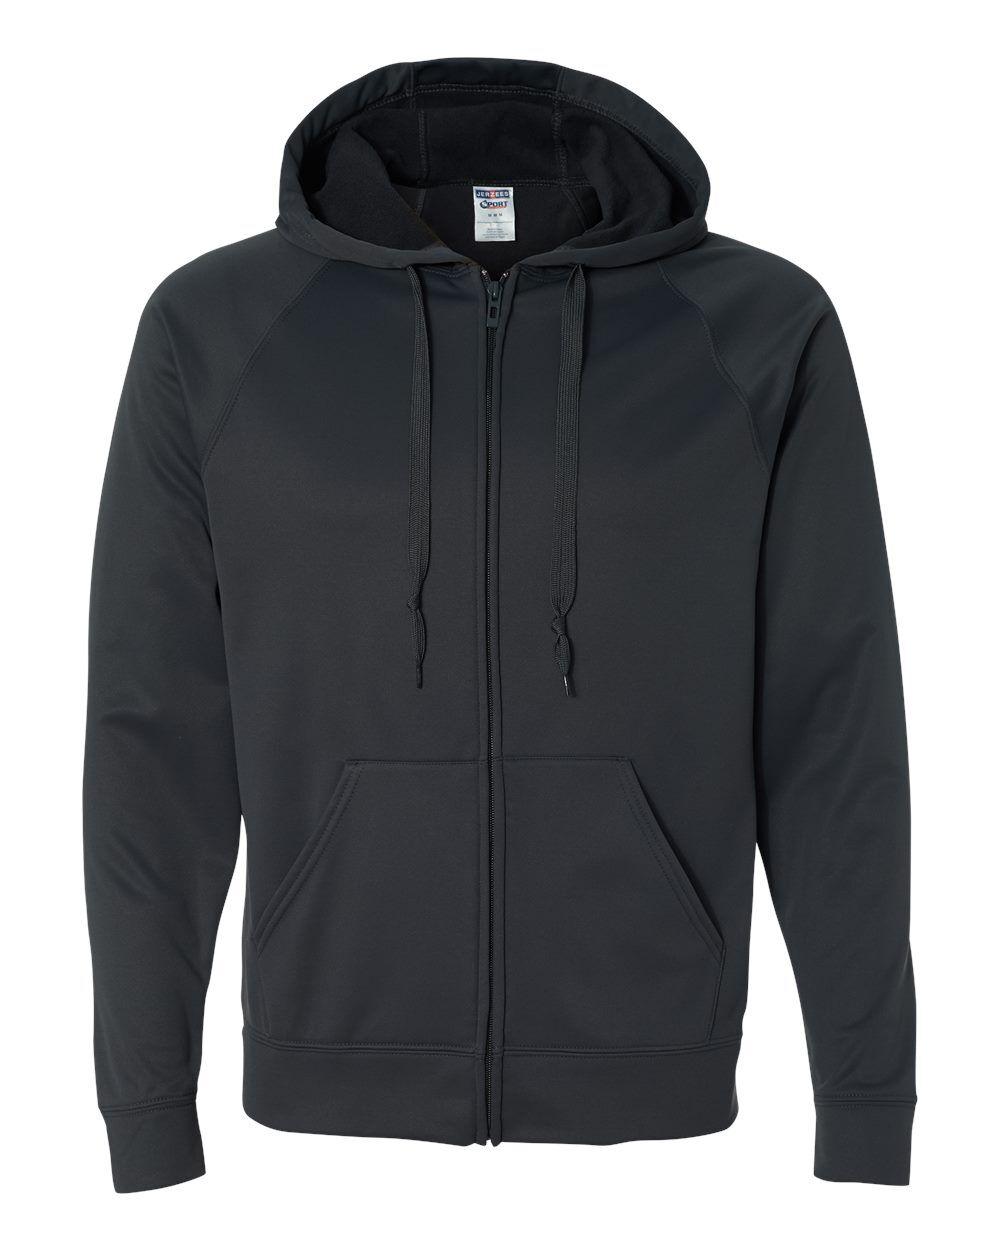 JERZEES - Dri-Power Sport Hooded Full-Zip Sweatshirt - PF93MR - Stealth - 2X-Large